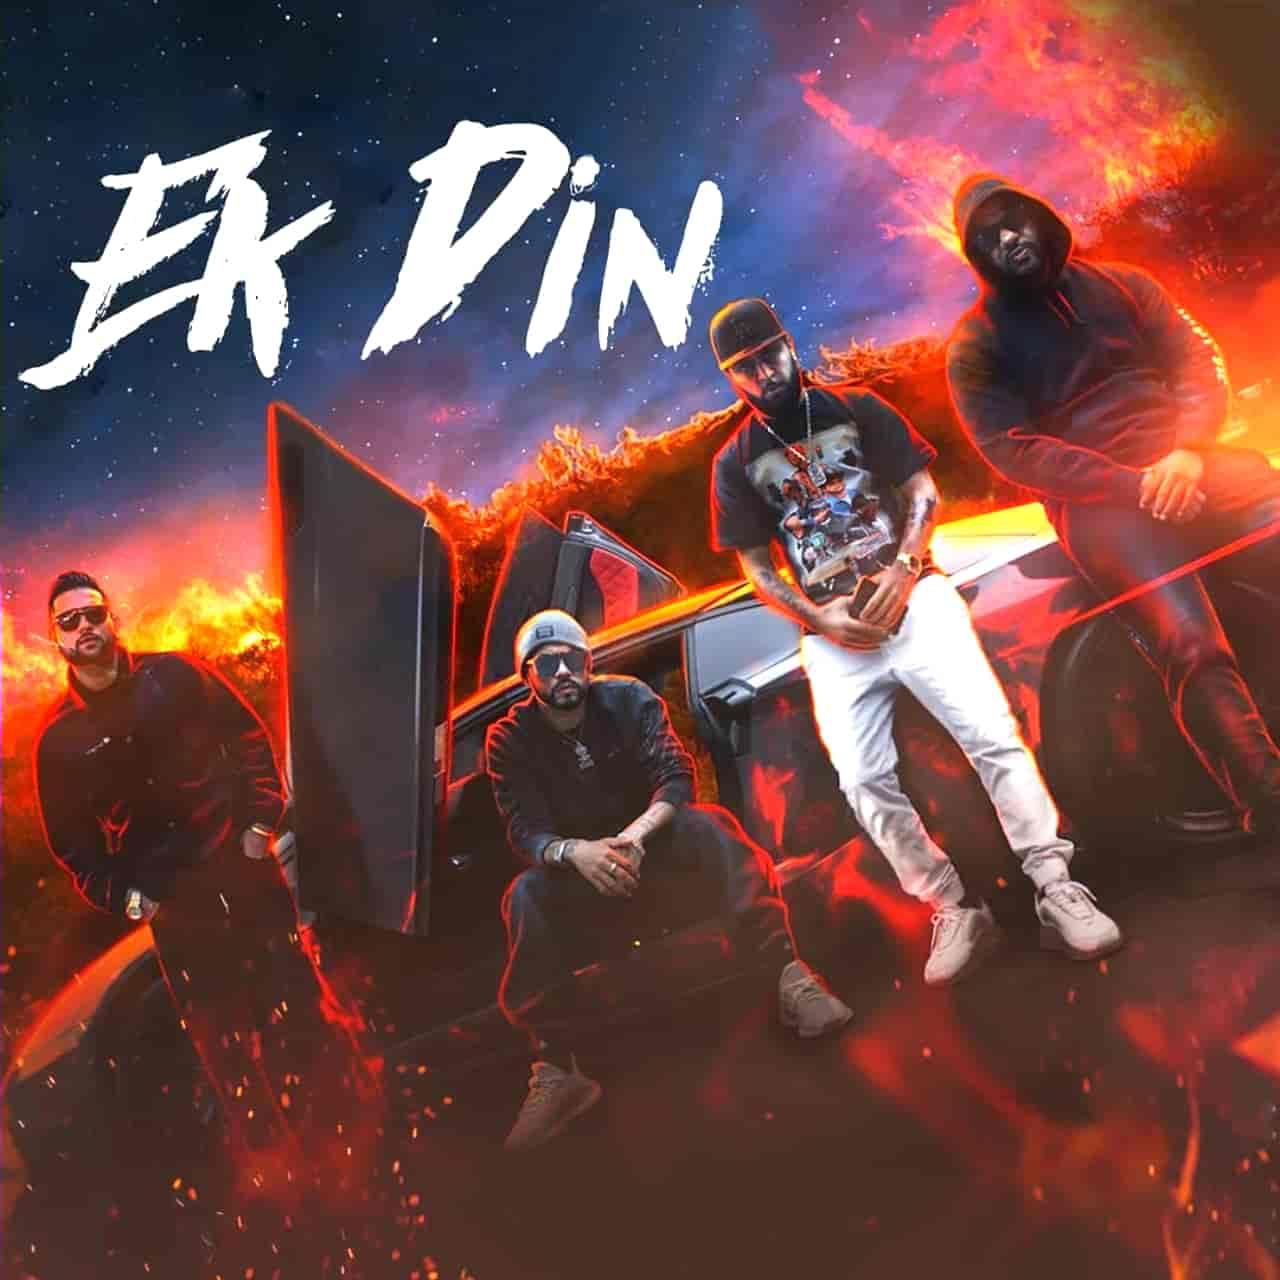 Ek Din Punjabi Rap Song Image Features Bohemia and Karan Aujla